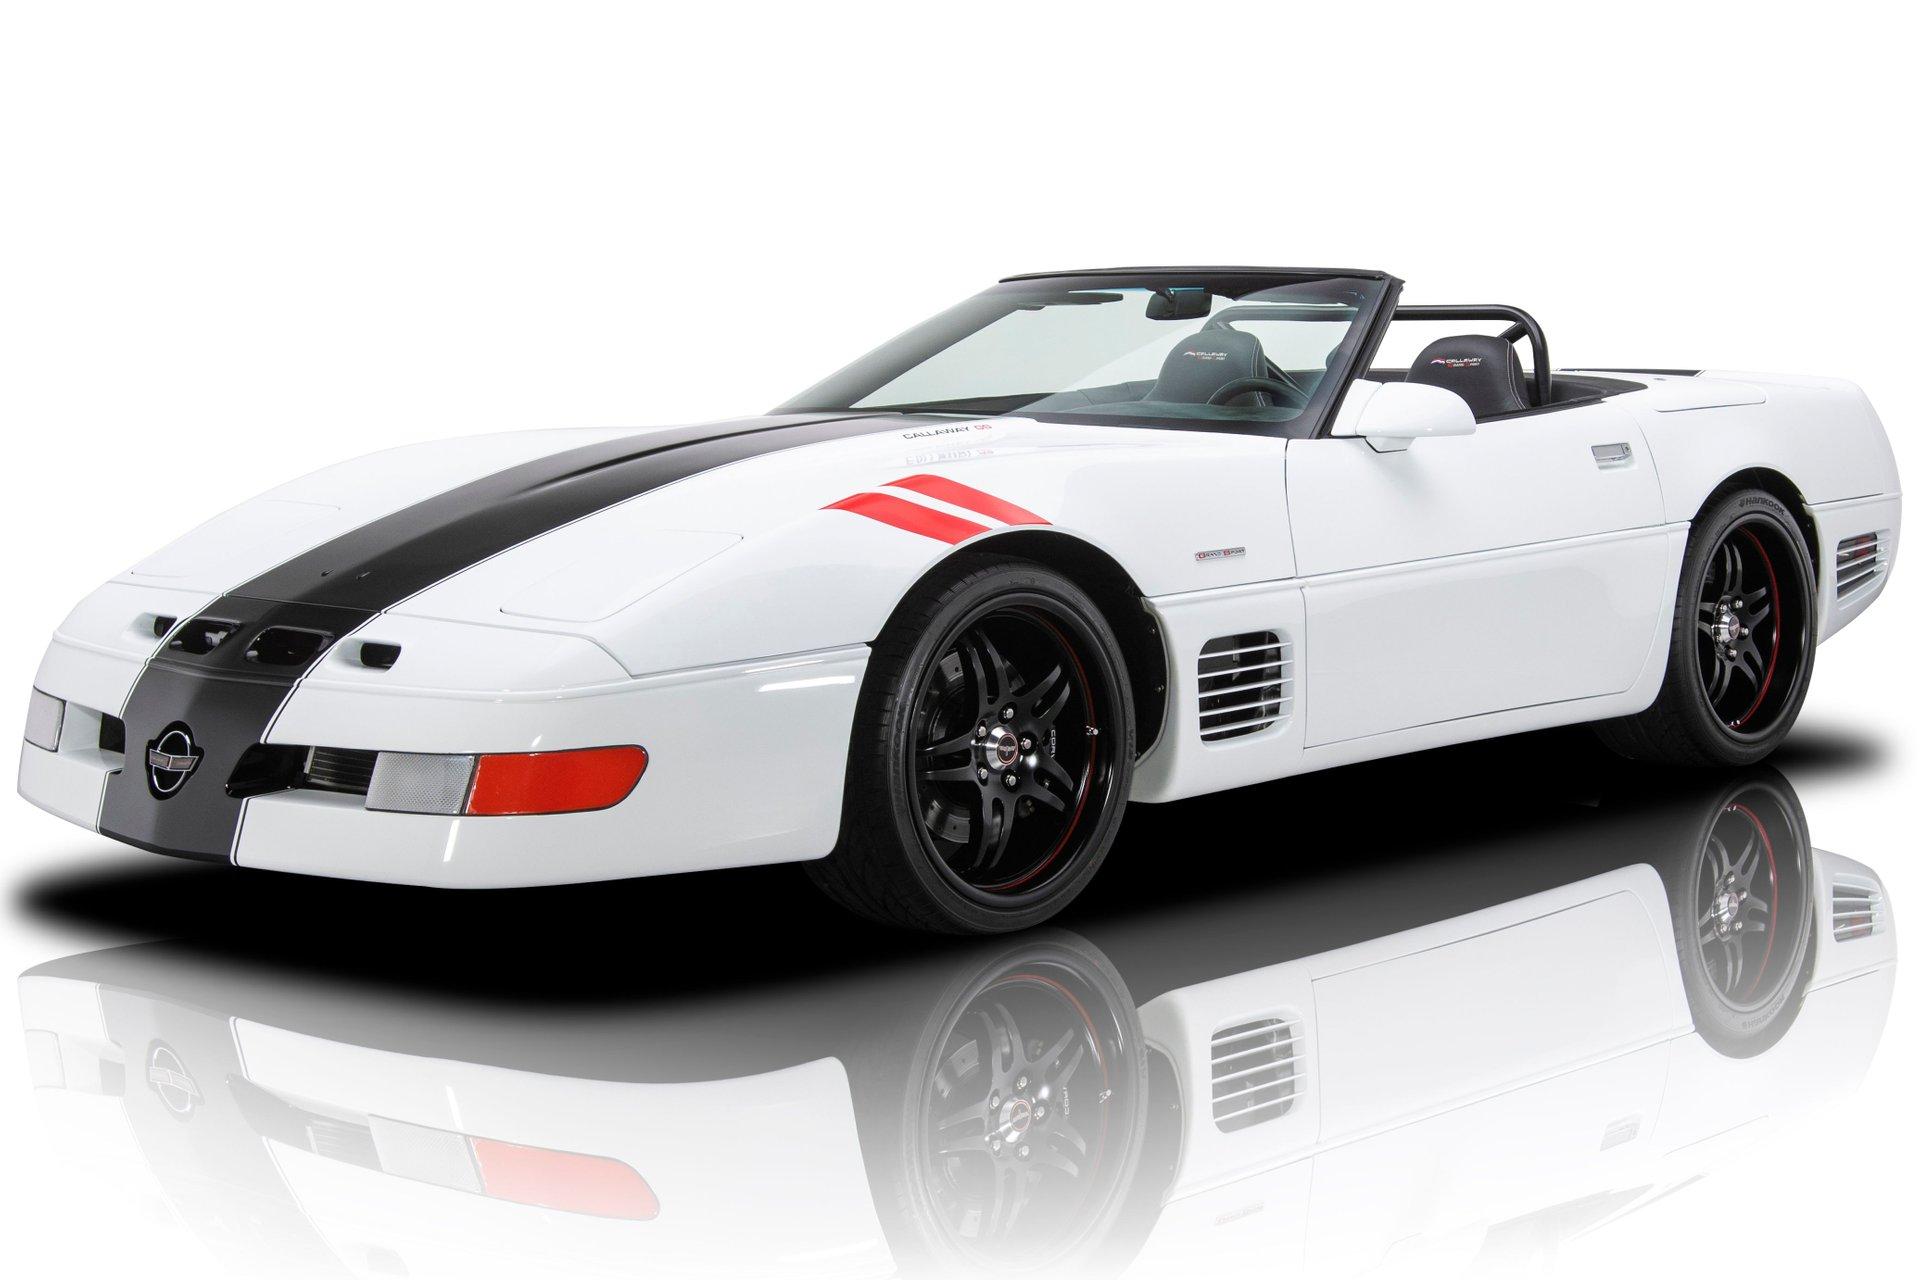 1996 chevrolet corvette callaway gs supernatural